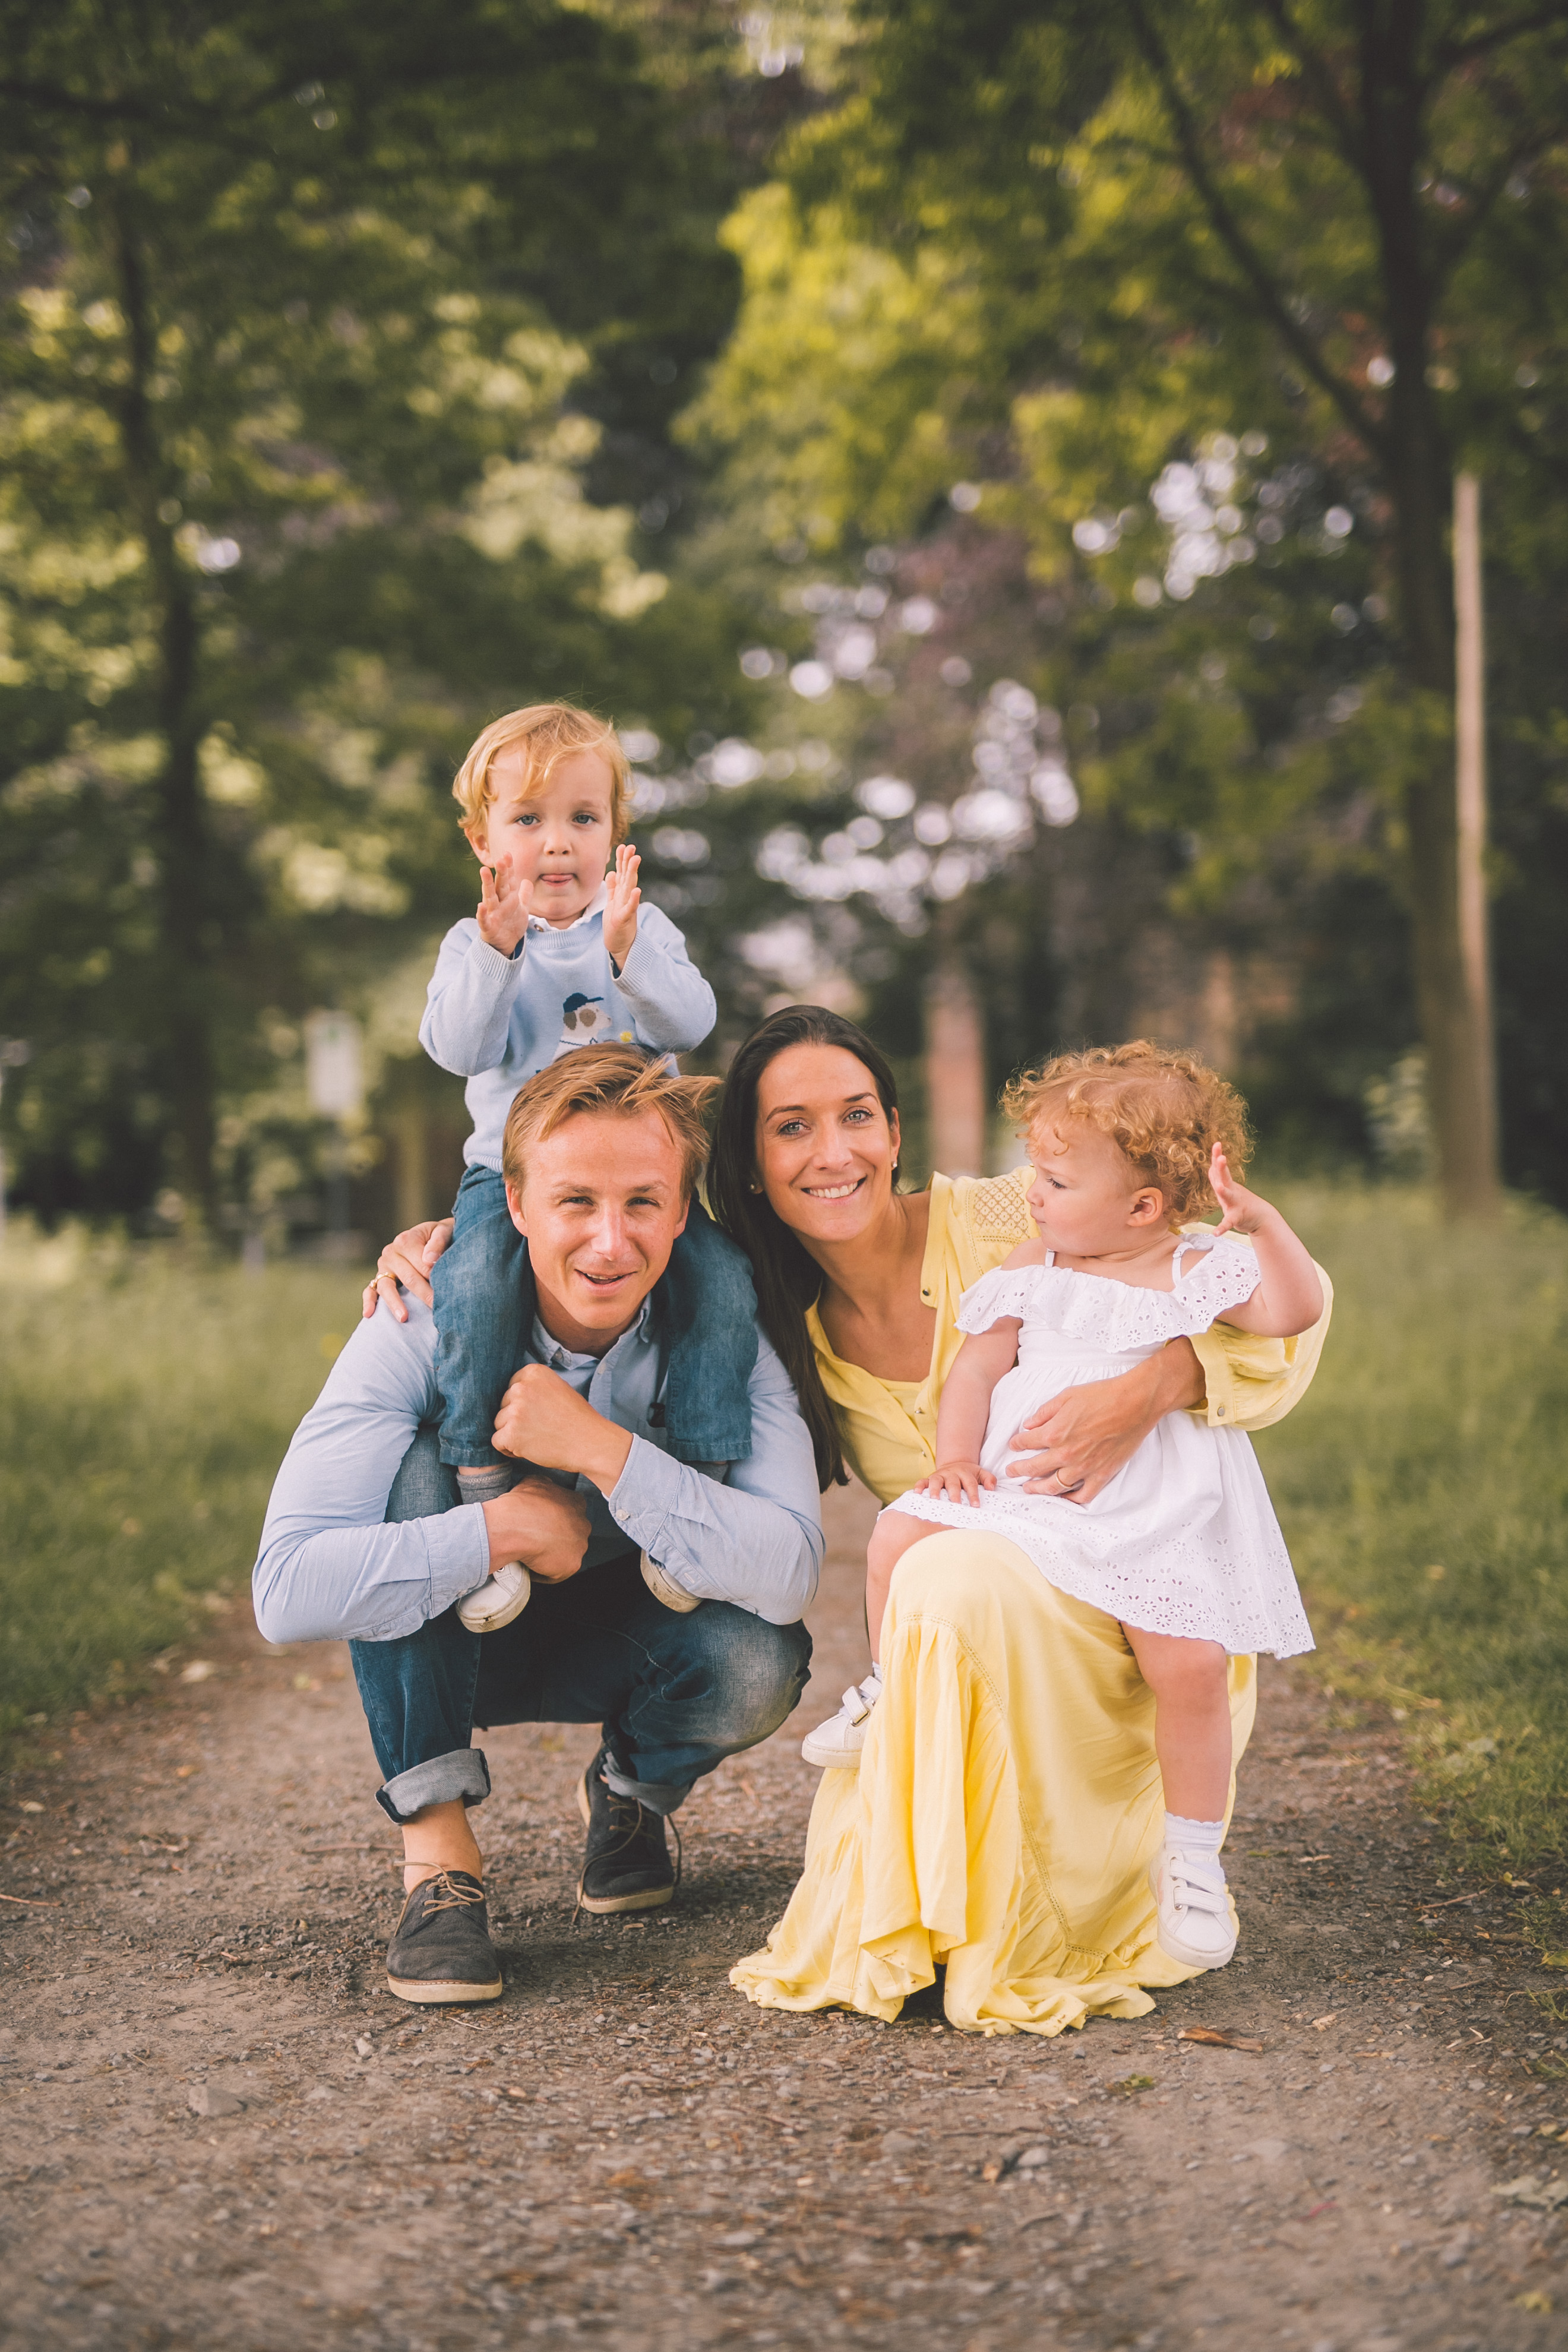 FAMILIE DE MULDER-5541